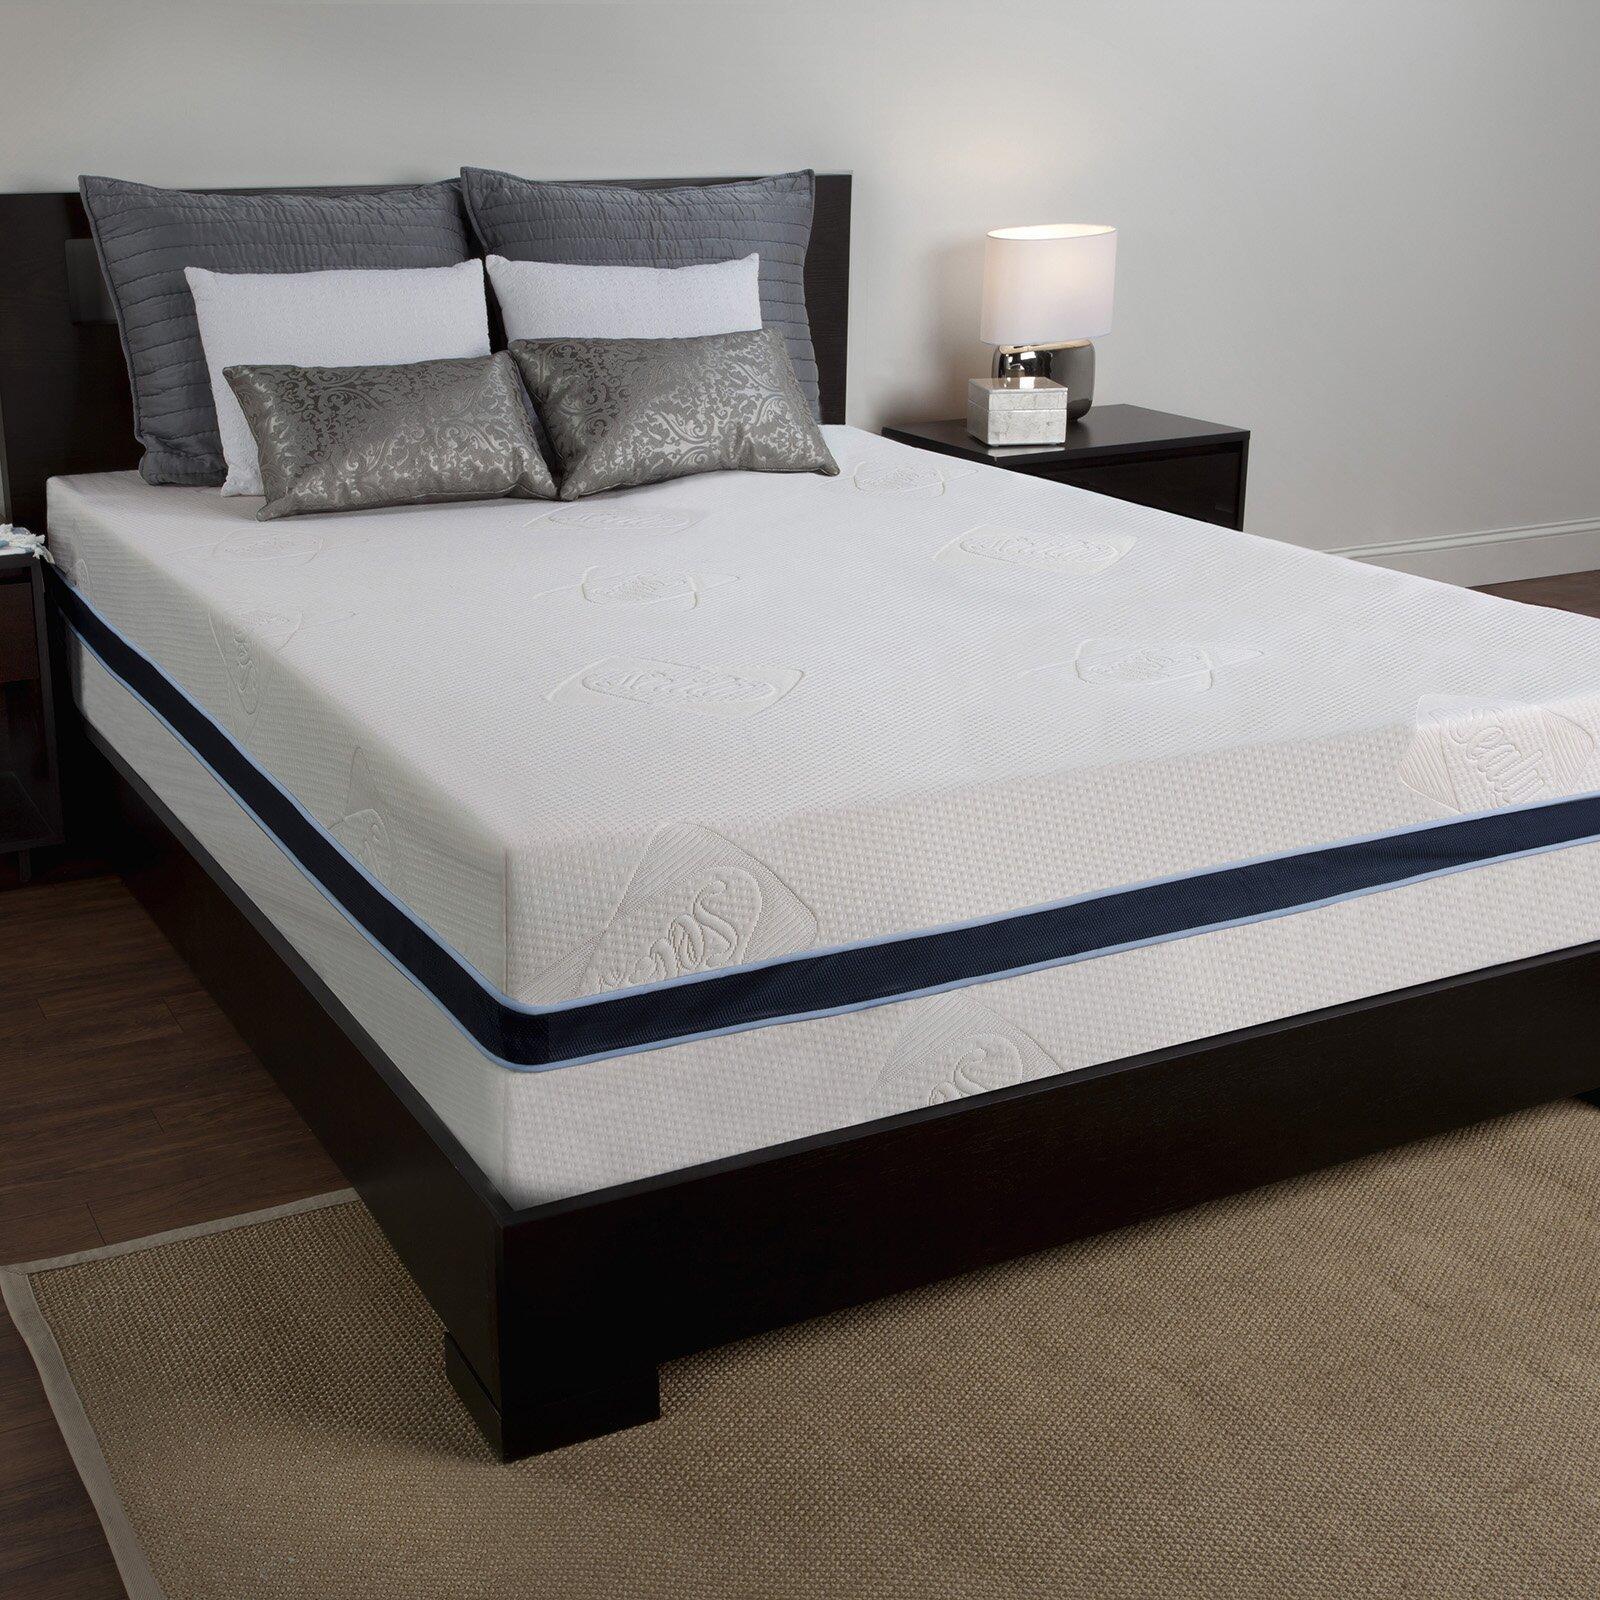 elegant ikea bed frame for memory foam mattress insured by ross